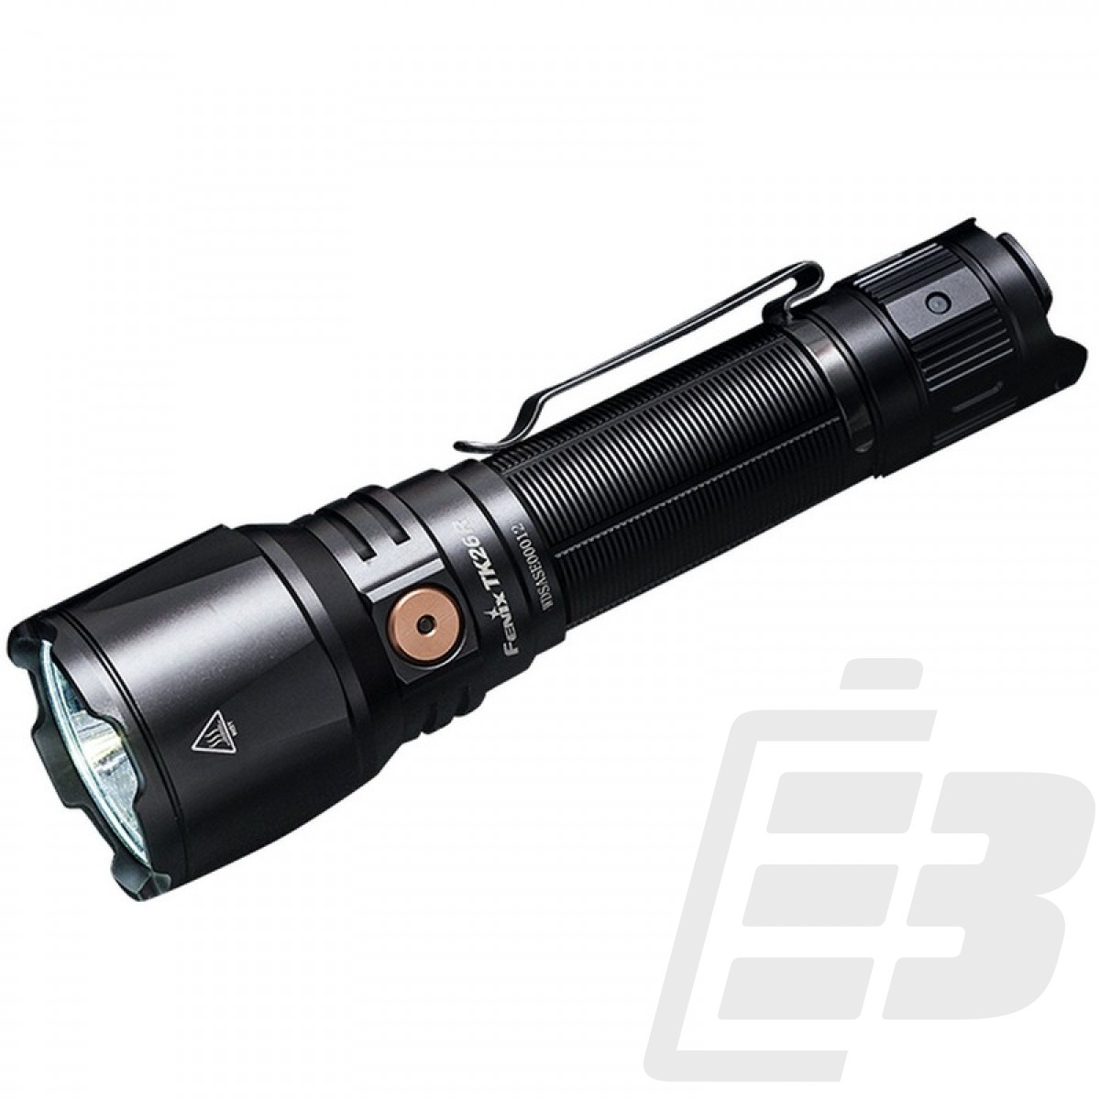 Fenix TK26R LED Flashlight_1